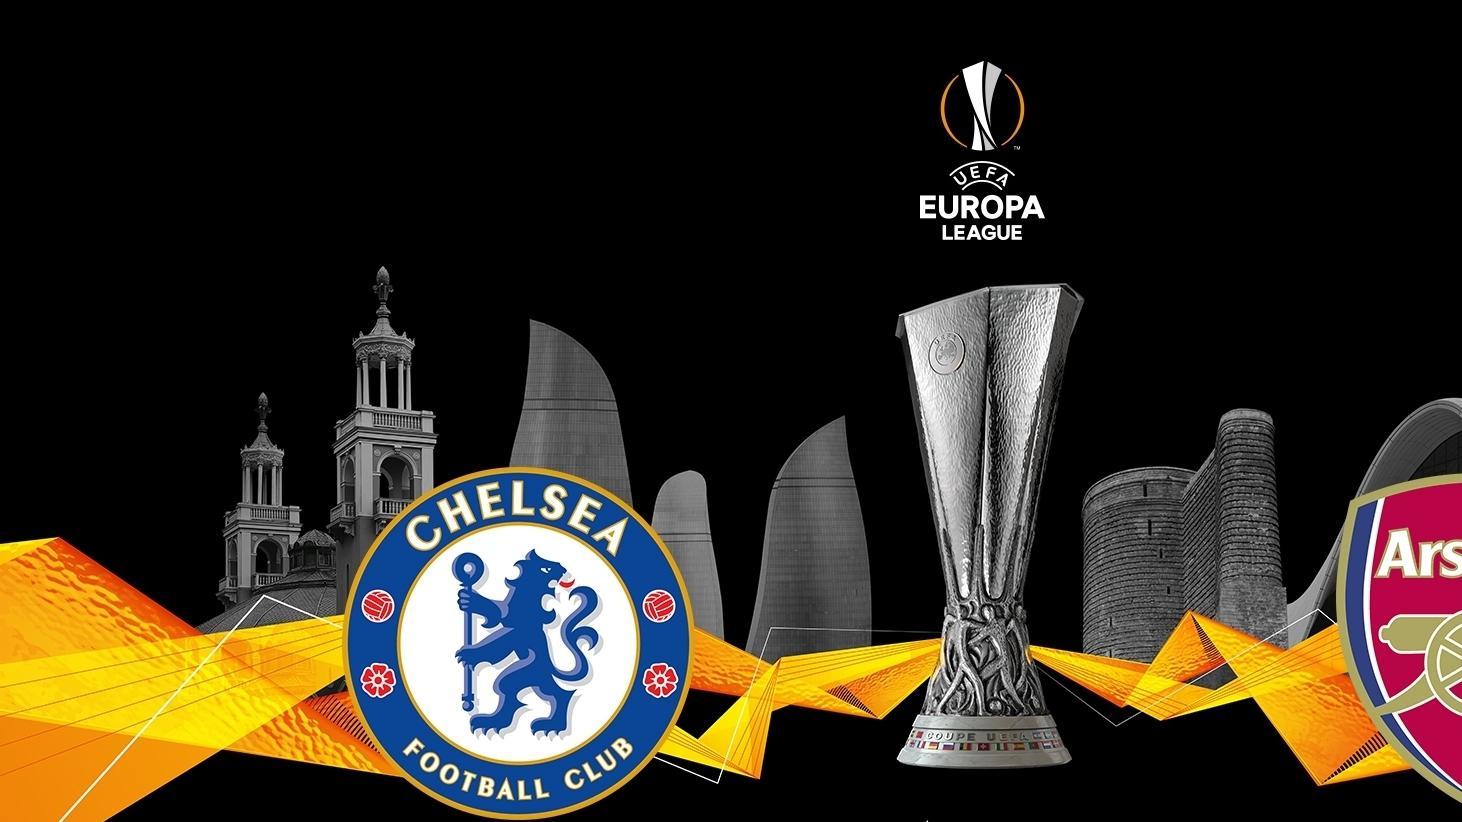 Endspiel Europa League